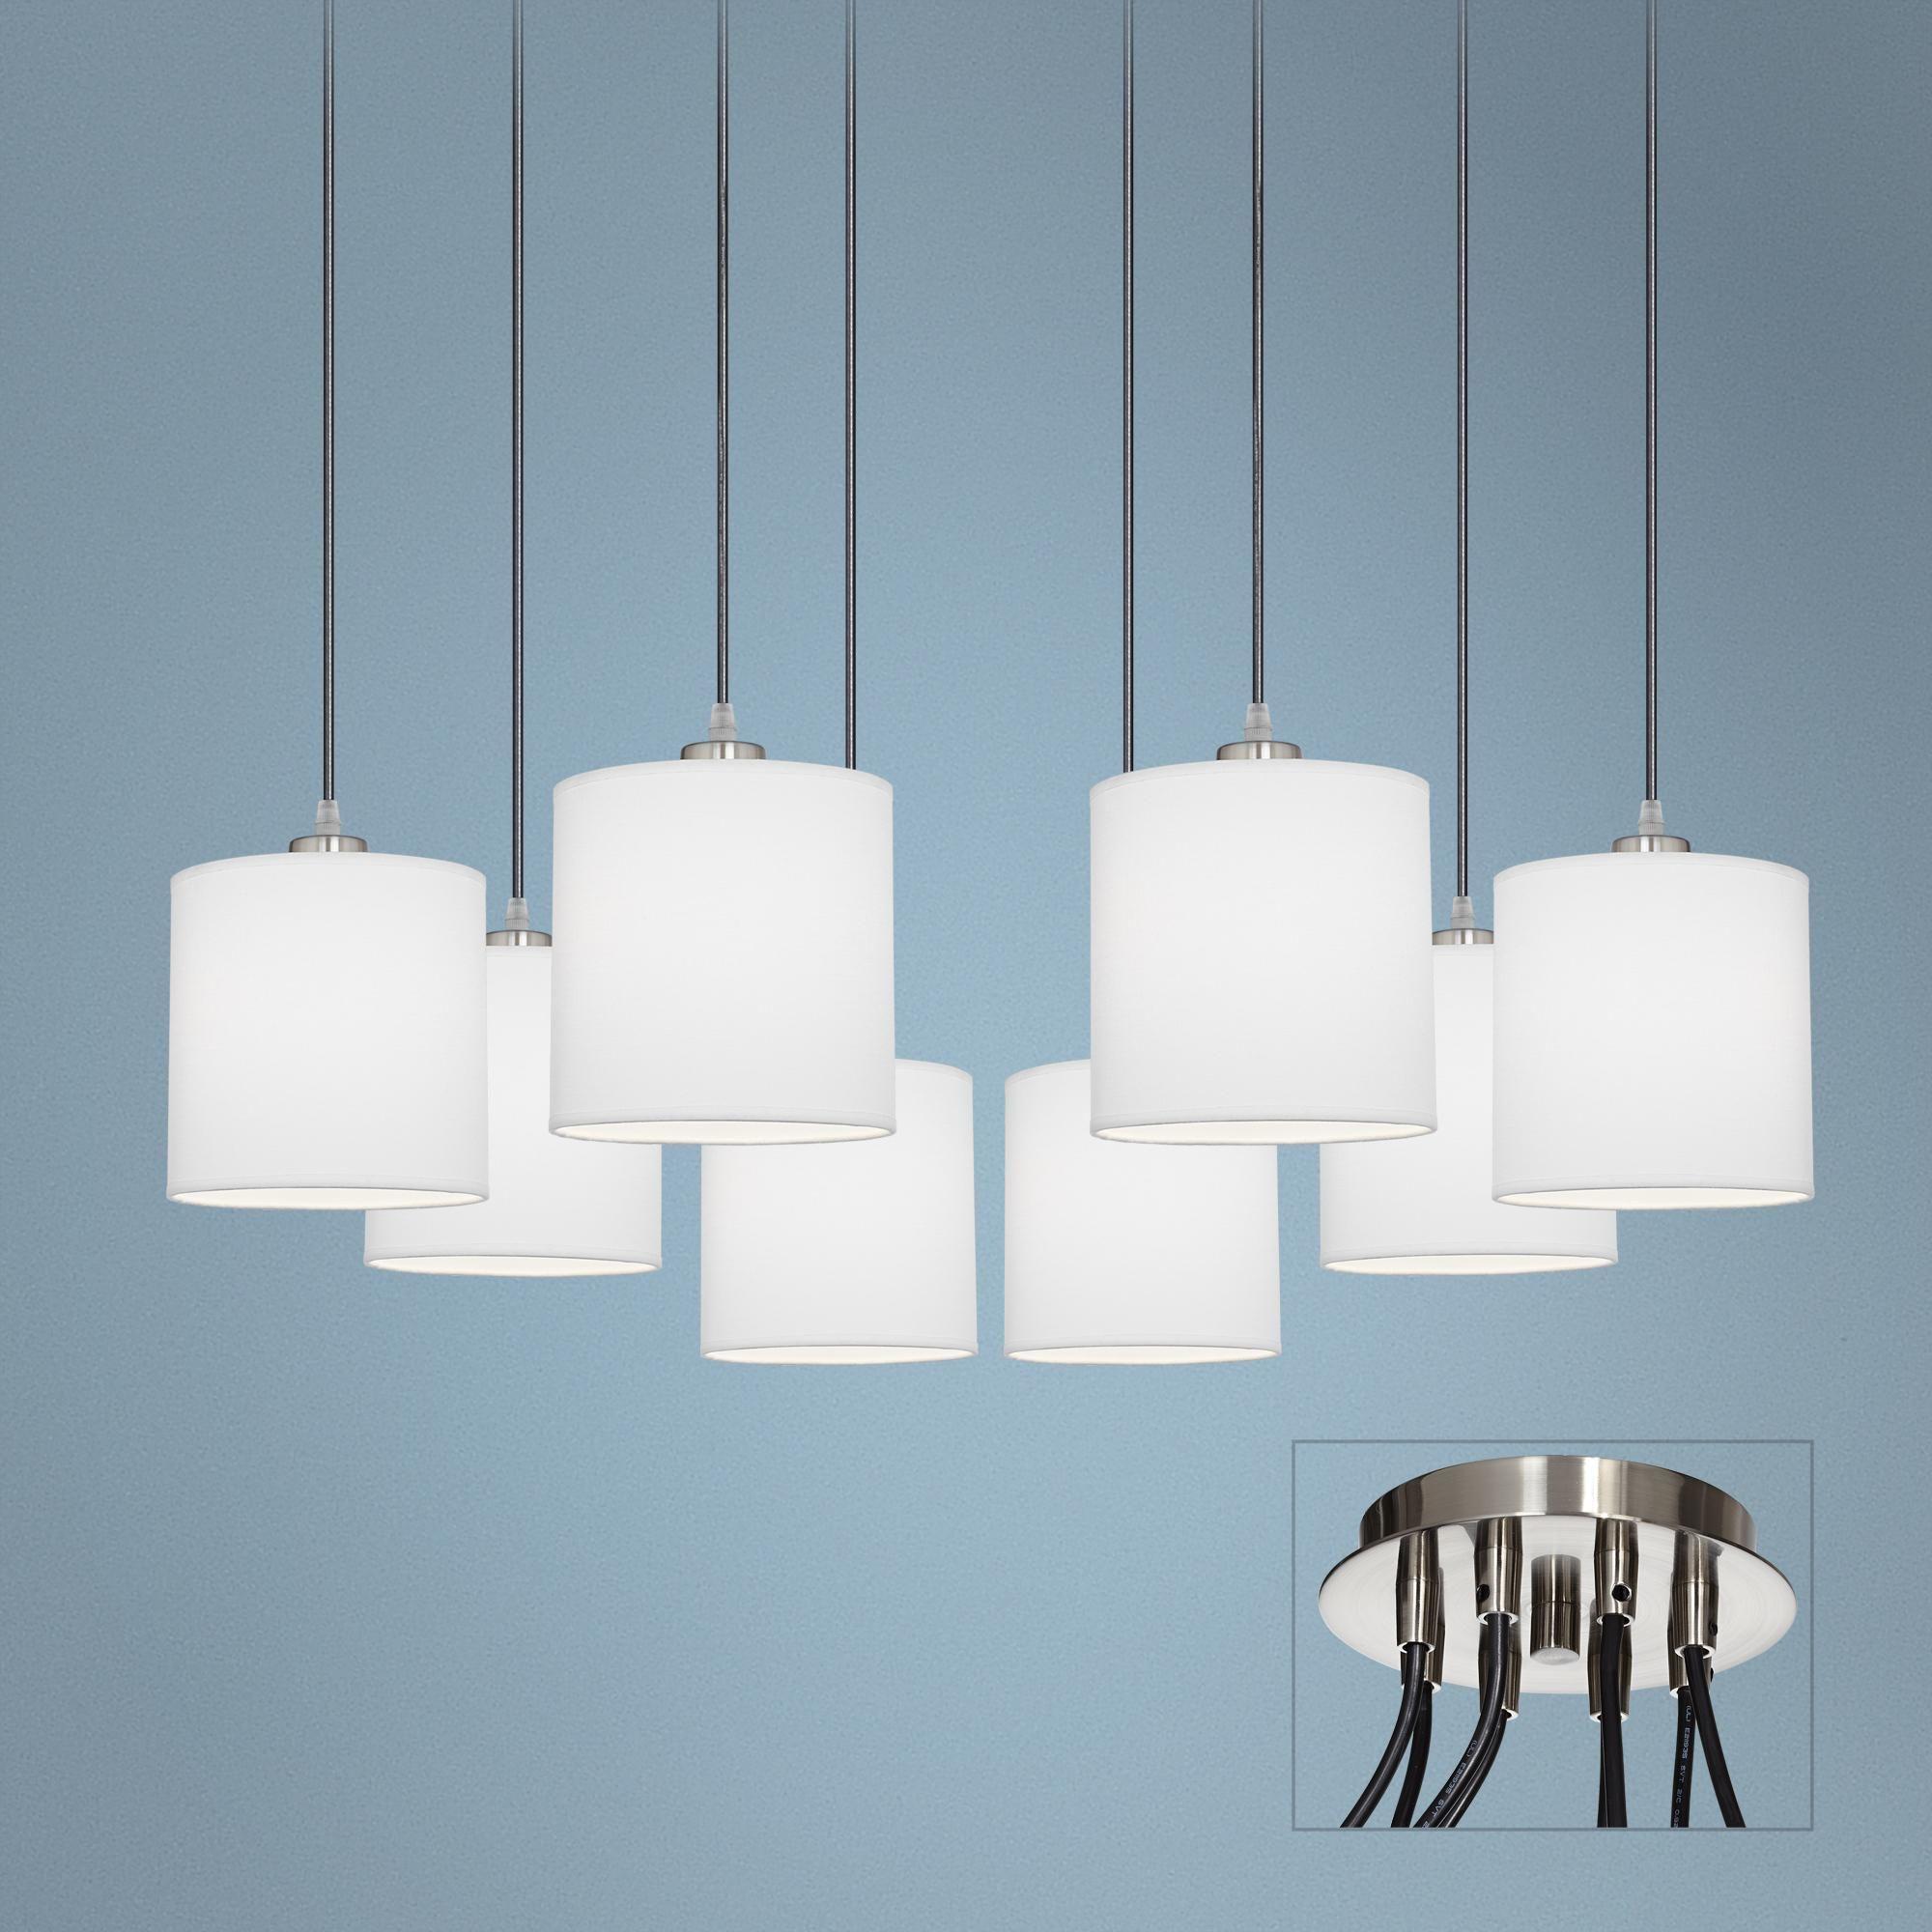 Otta 8-Light Adjustable Swag Chandelier - | Remodel Ideas ...